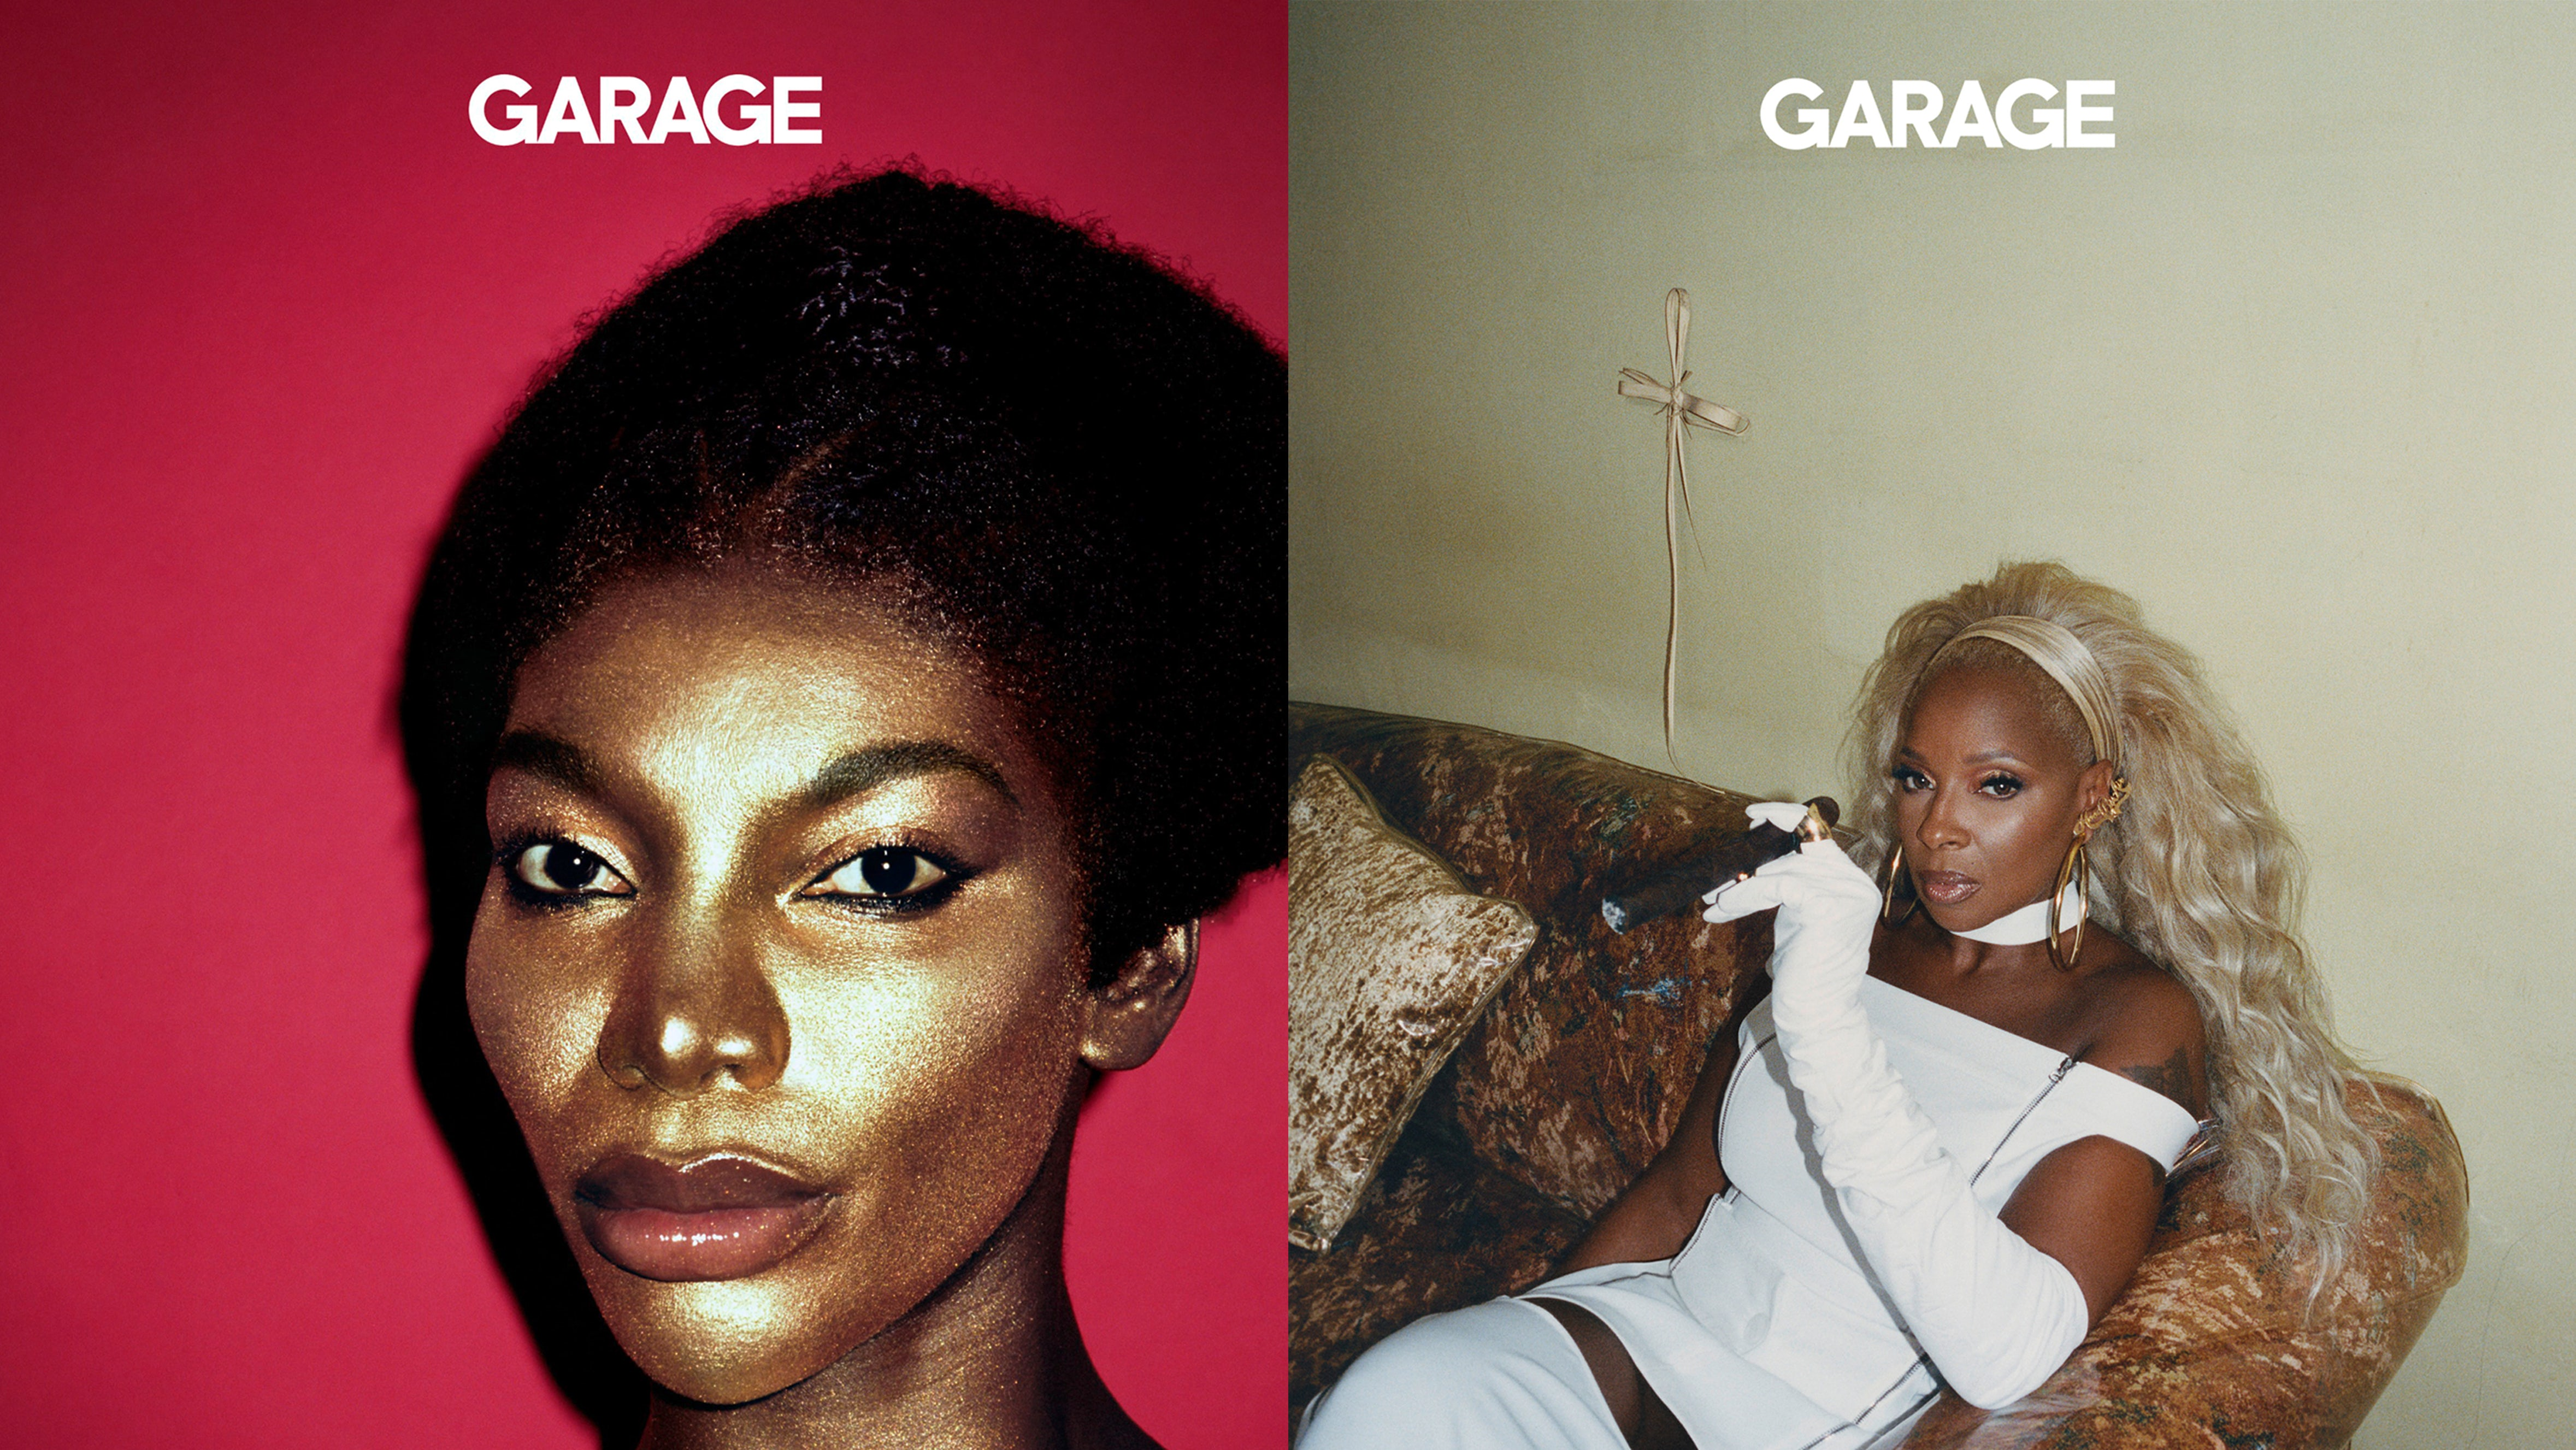 Garage Magazine Issue 19 featured Michaela Coel and Mary J. Blige. Garage Magazine.